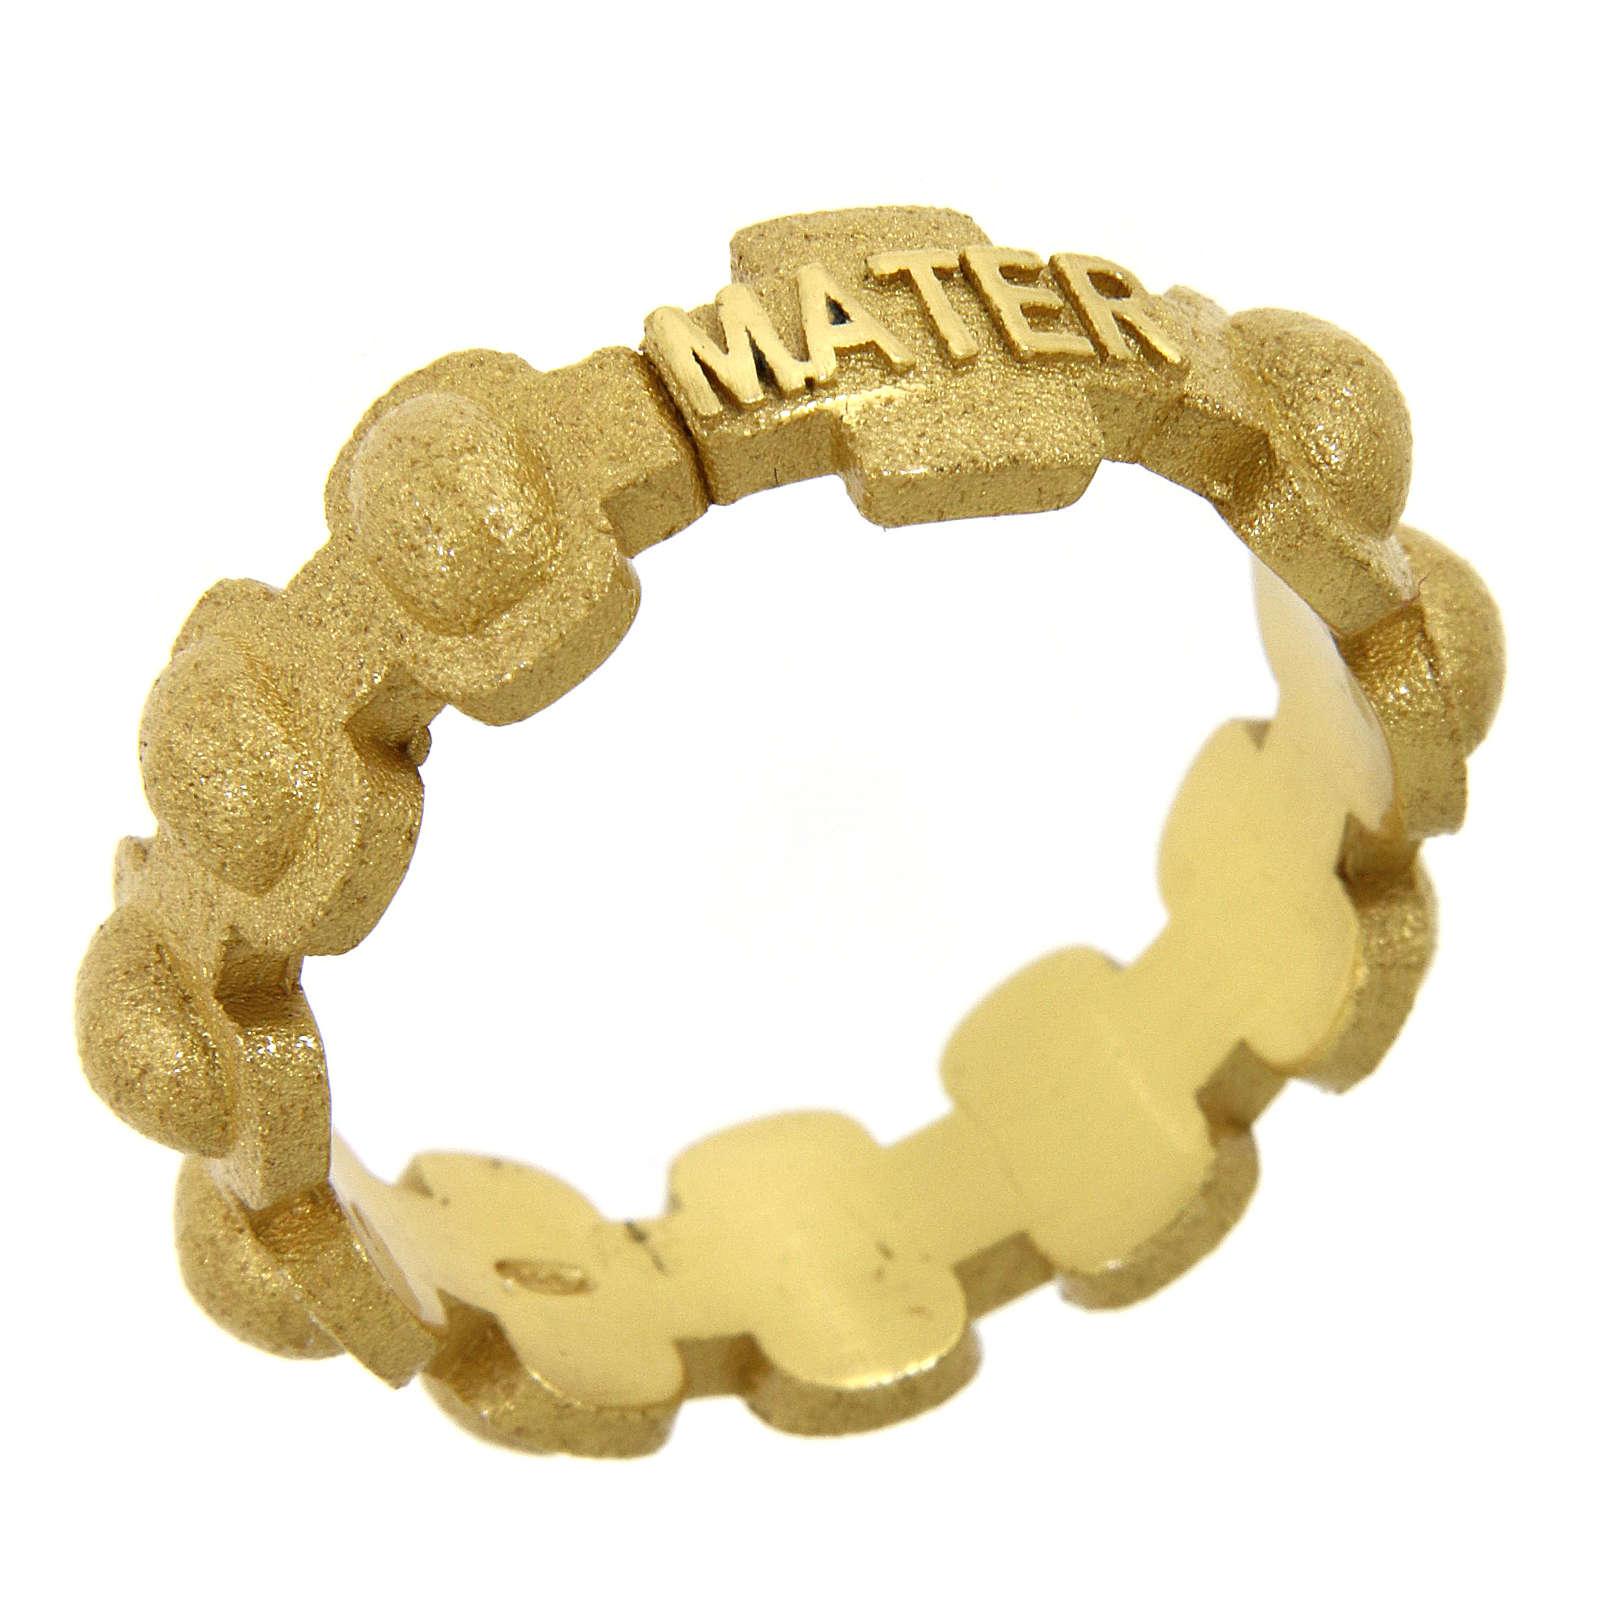 Fedina rosario MATER sabbiata dorata argento 925 3